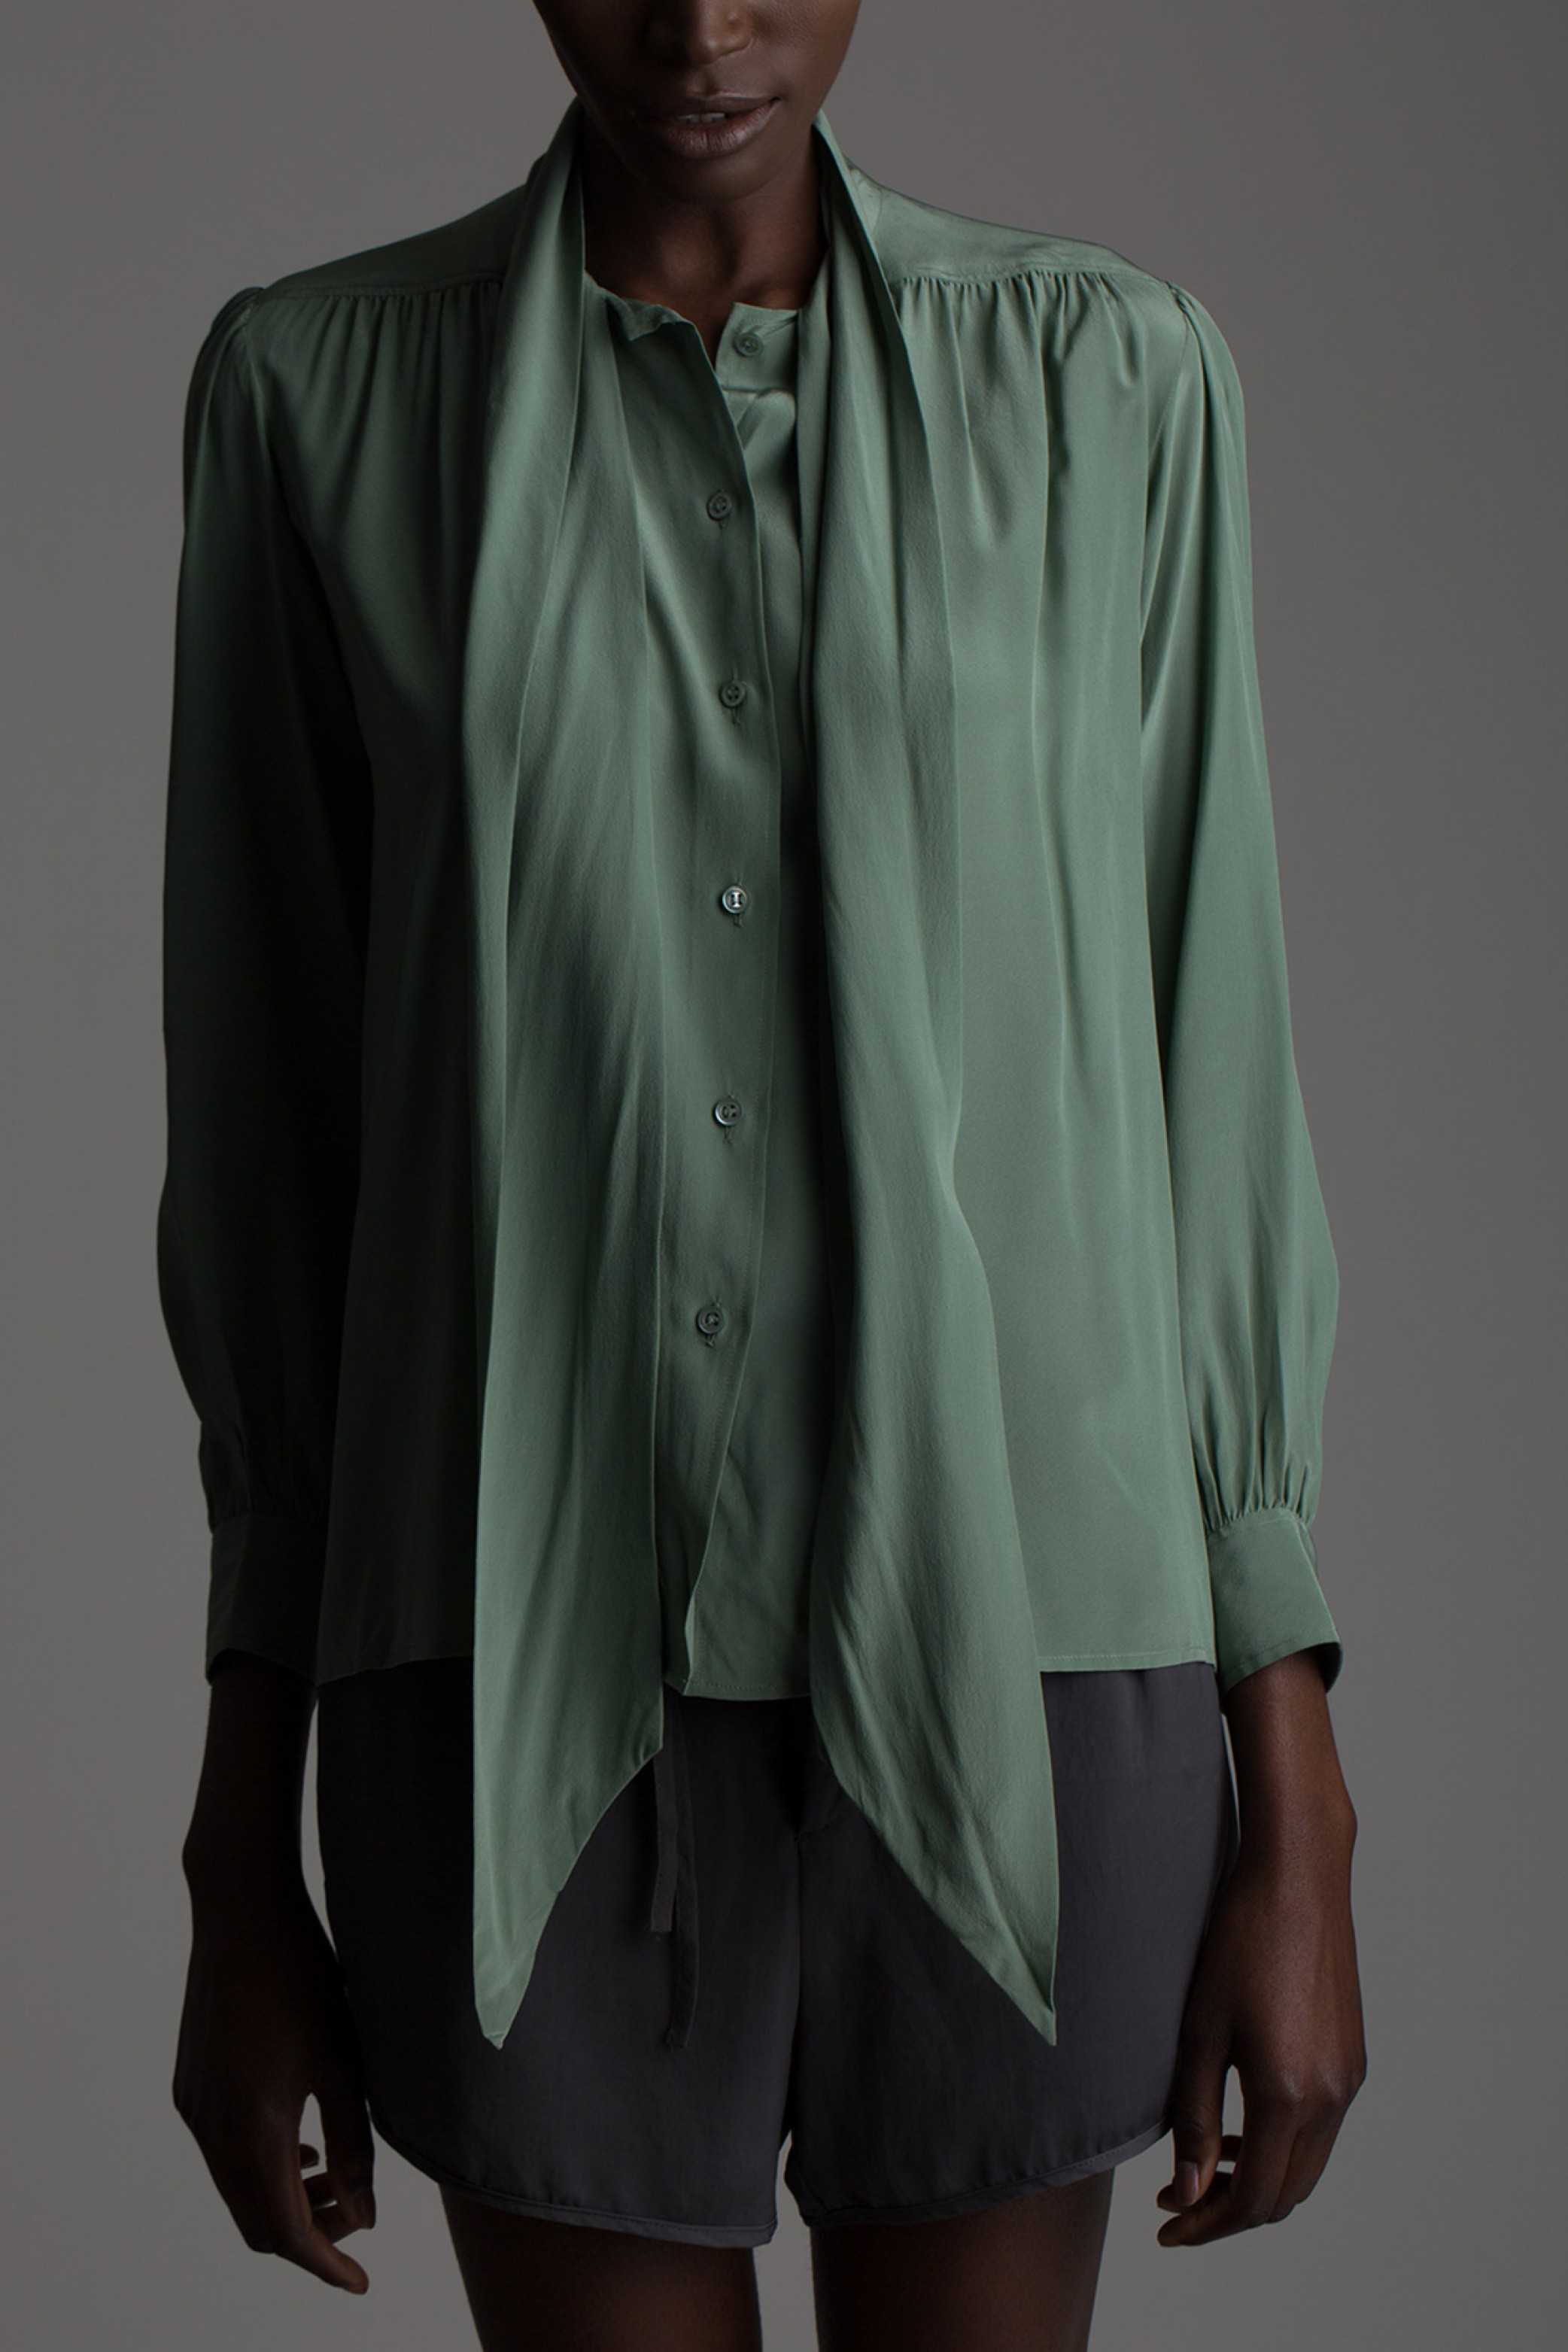 2d43a611b2 Vintage Yves Saint Laurent Silk Blouse | The New World Order